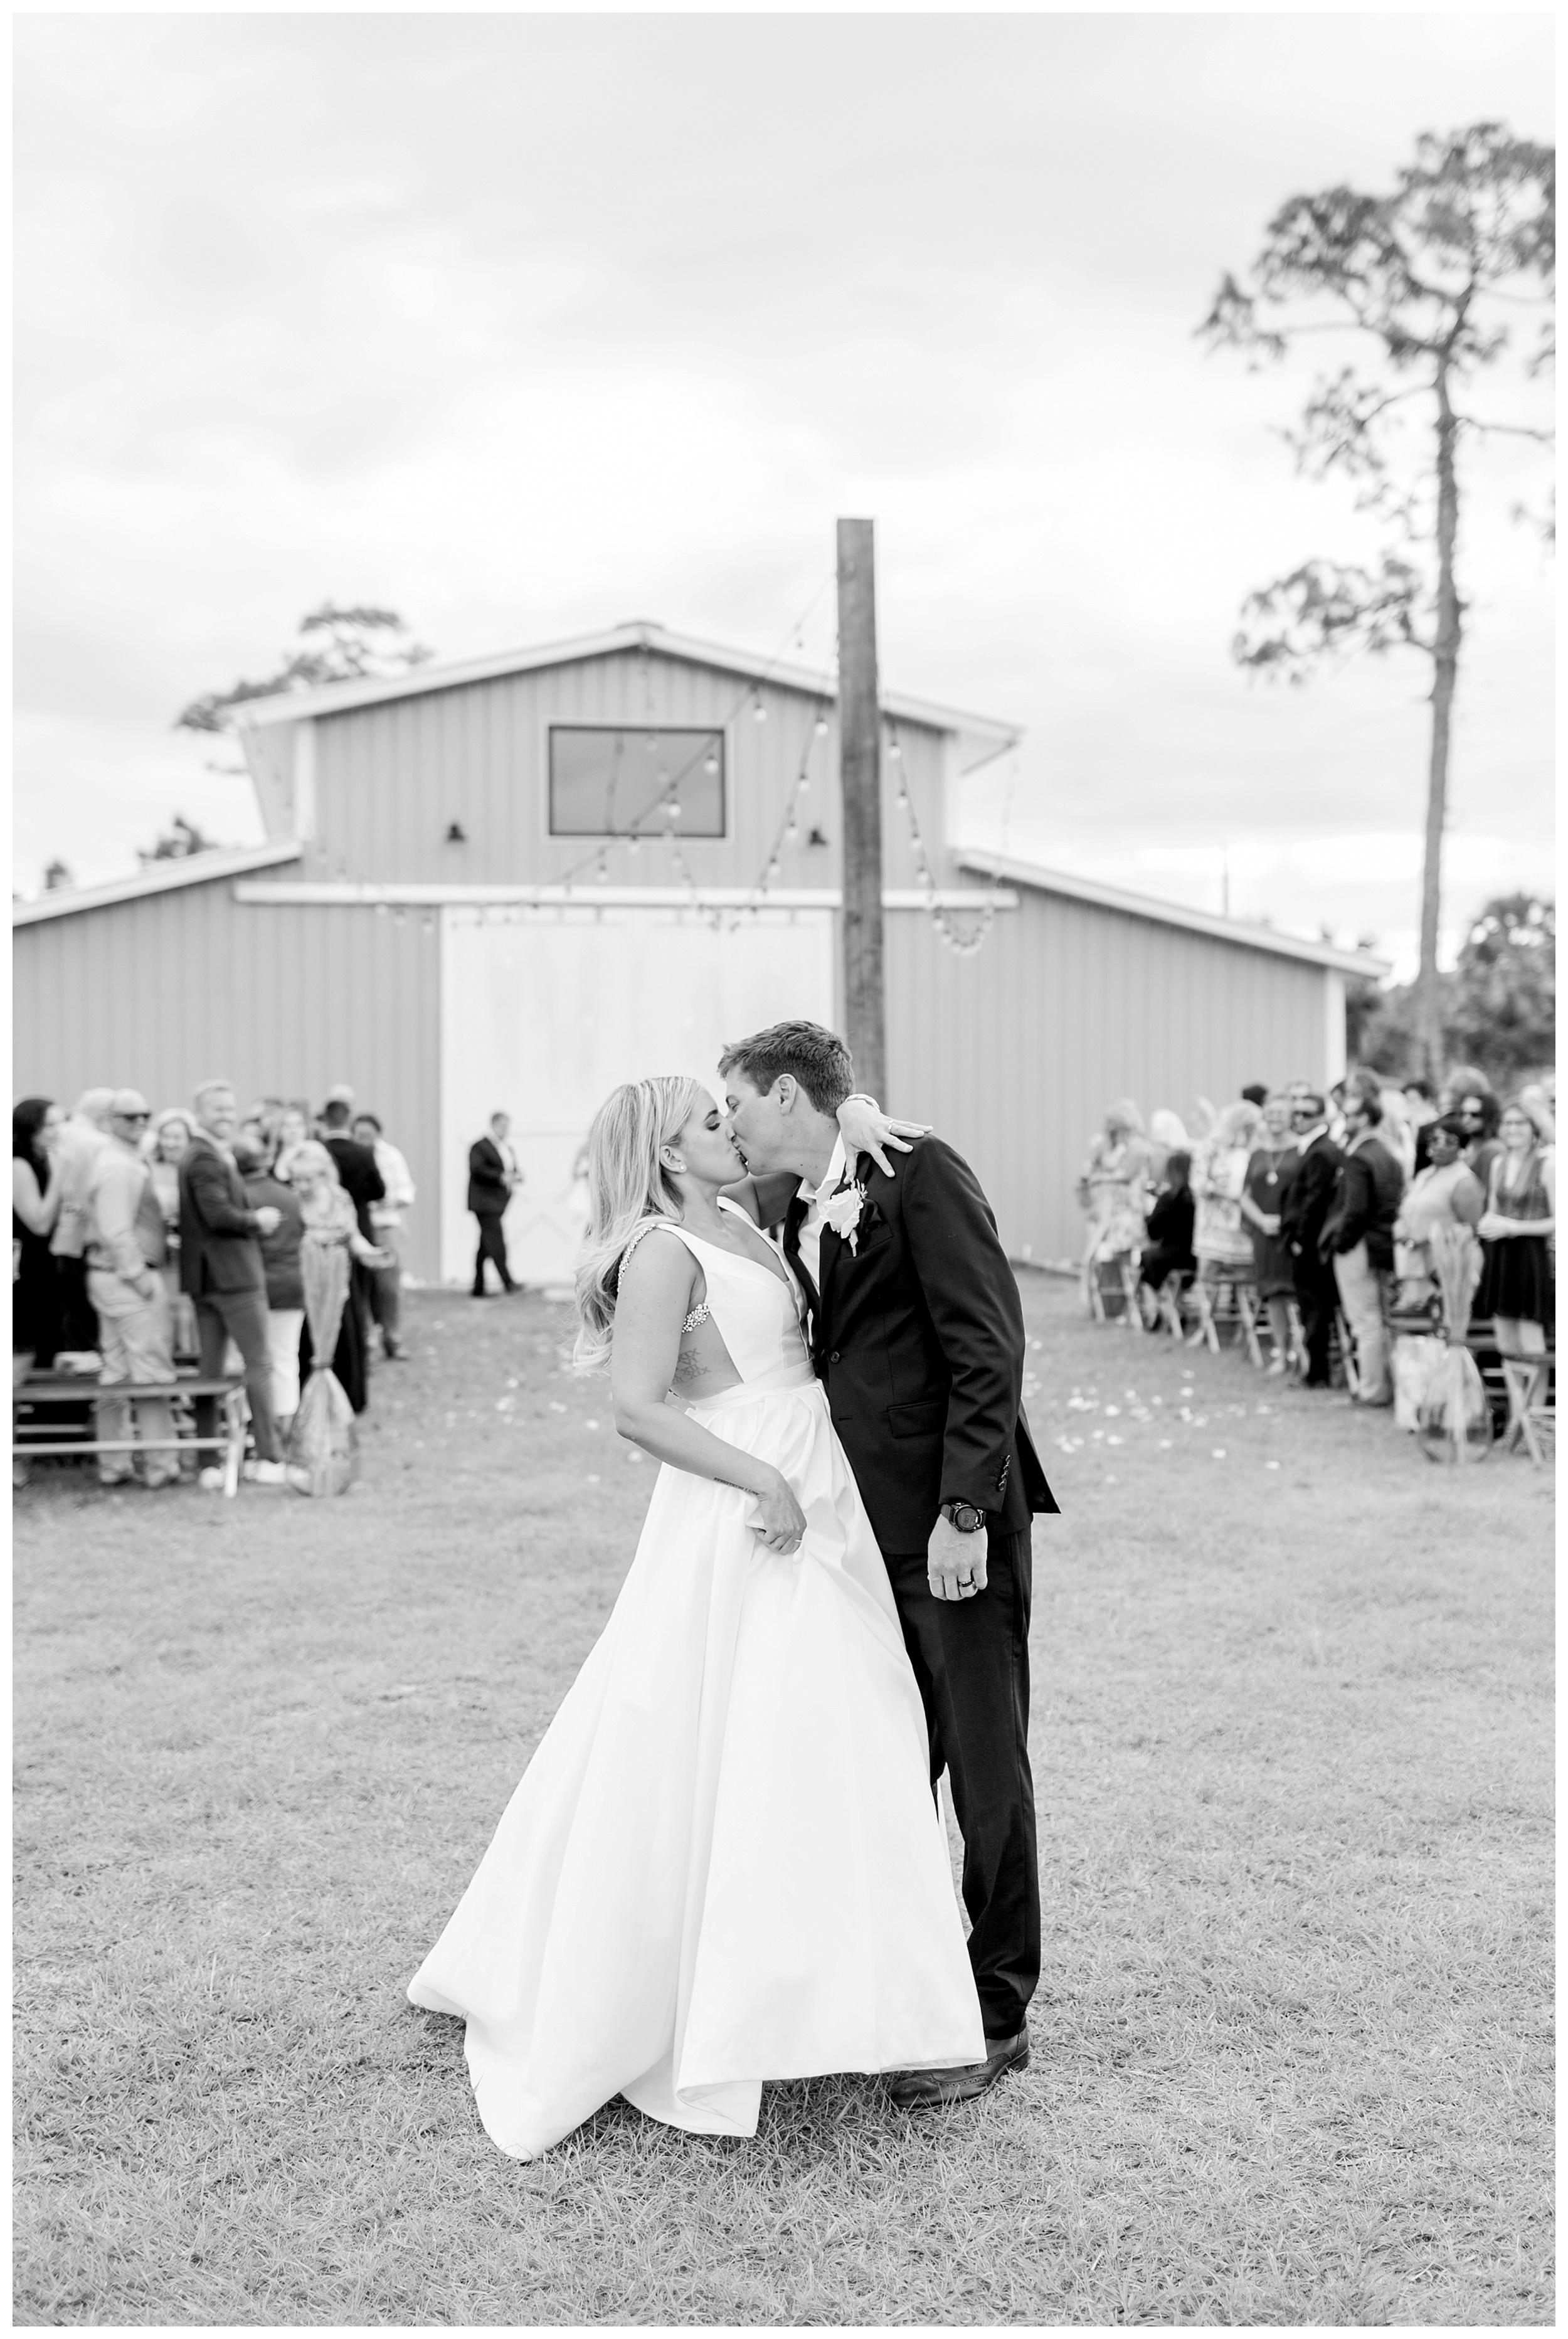 South Florida Wedding Photographer Kir Tuben_0083.jpg